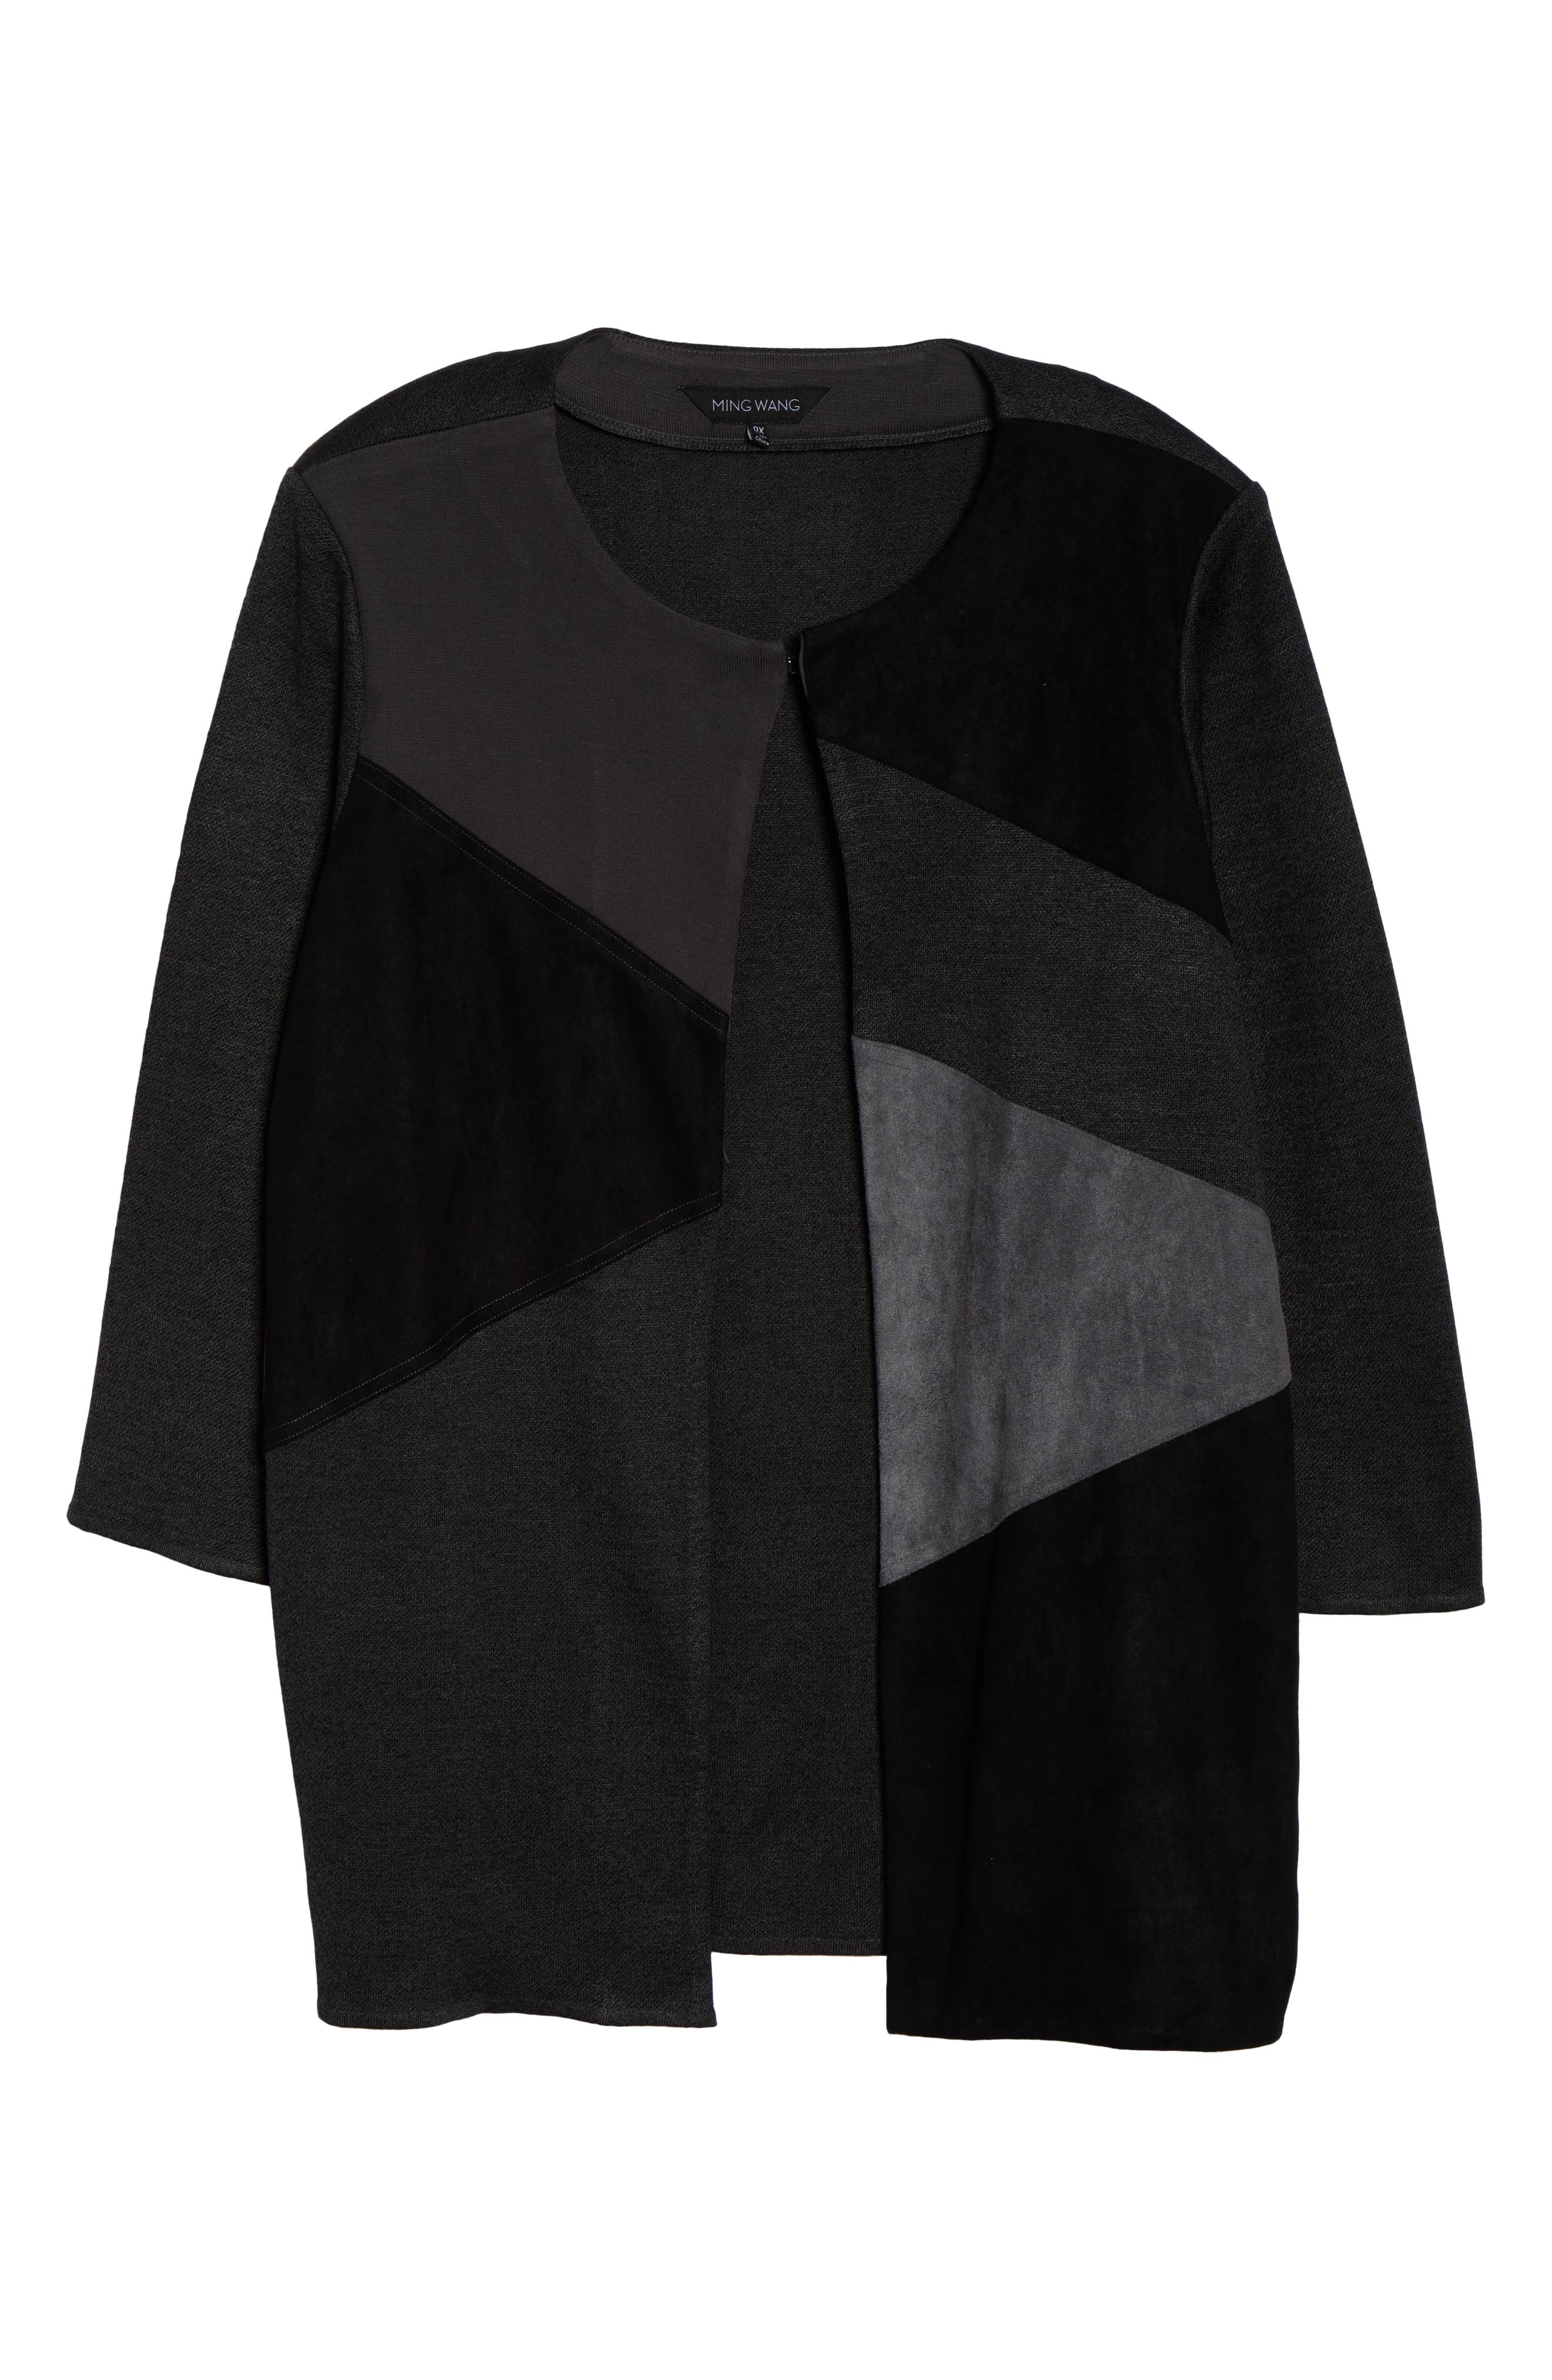 MING WANG,                             Colorblock Knit Jacket,                             Alternate thumbnail 6, color,                             BLACK/ GRANITE